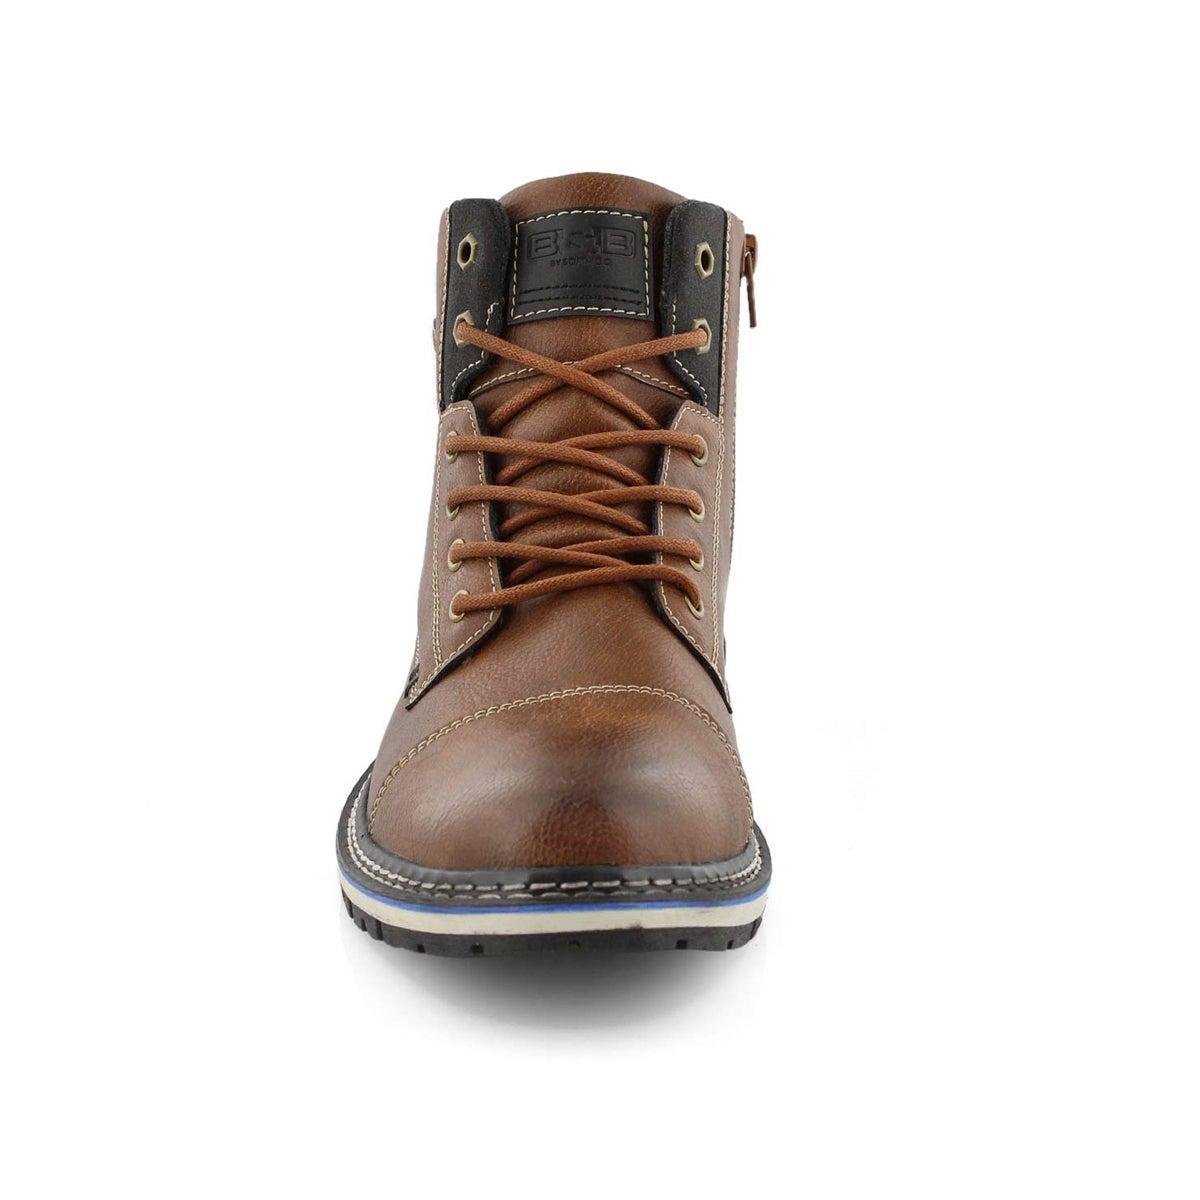 Mns Ballard2 cgnc lace up ankle boot